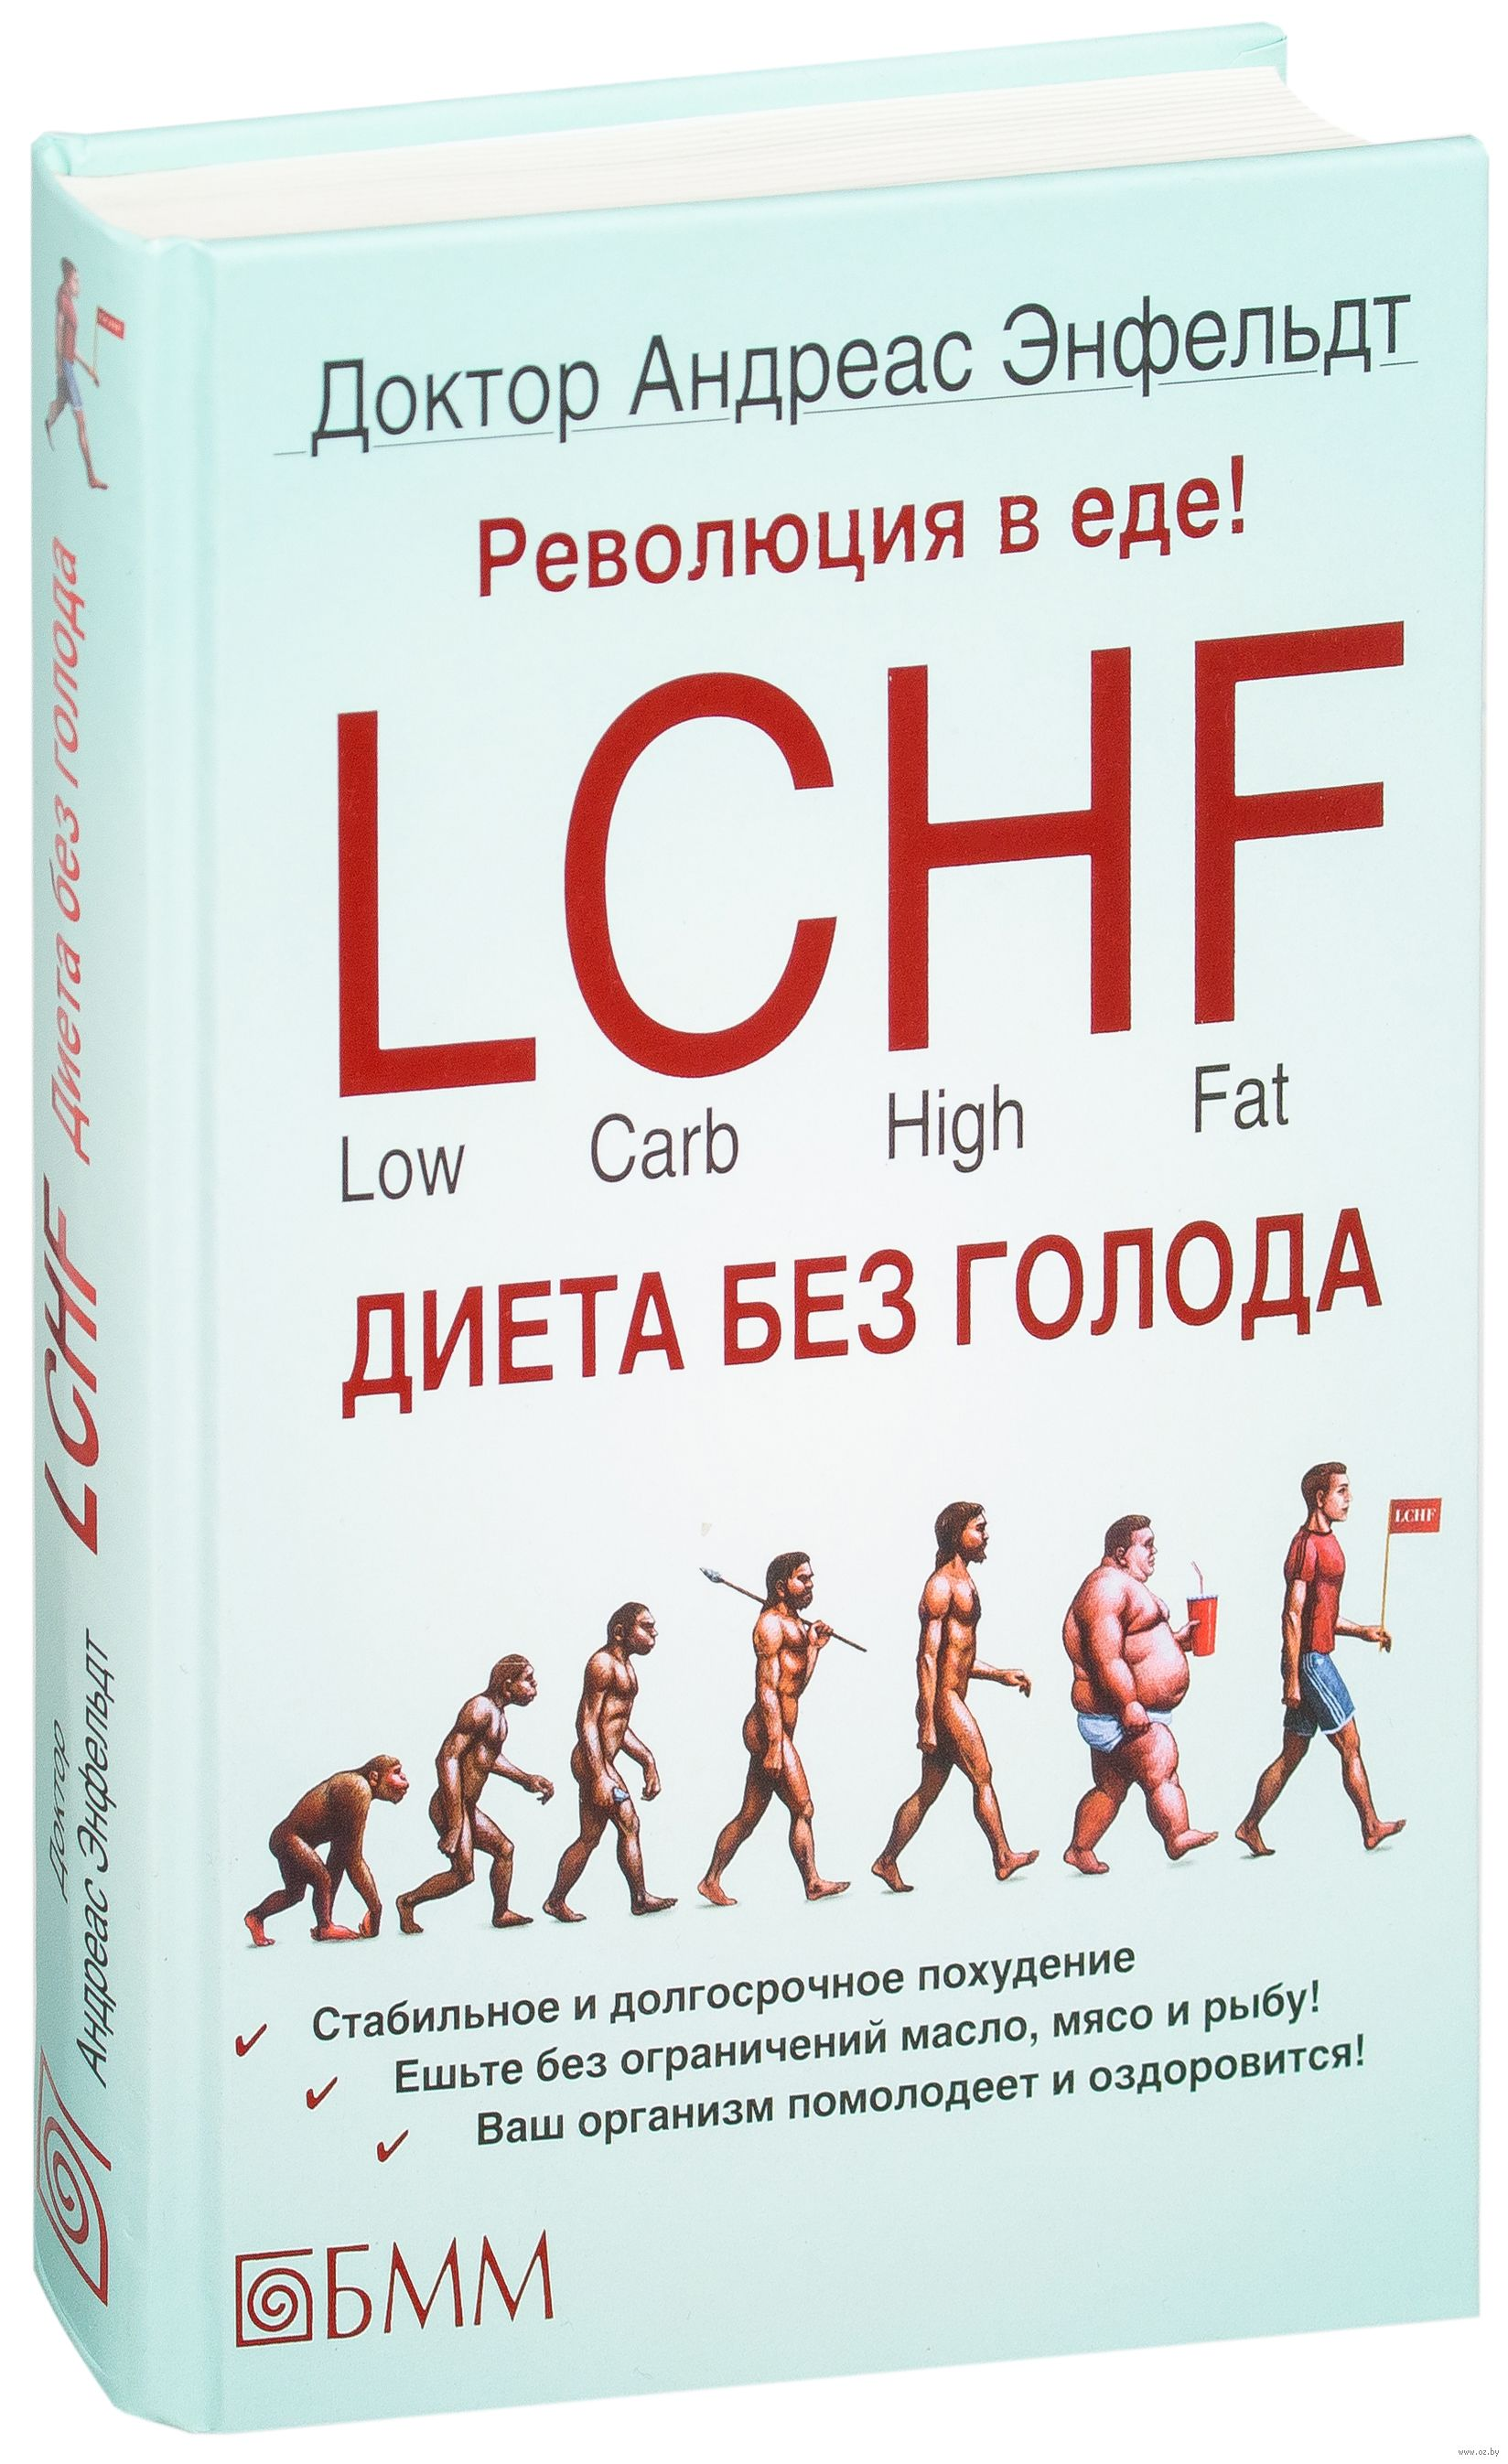 Lchf диета без голода, отзыв, отрывки из книги.